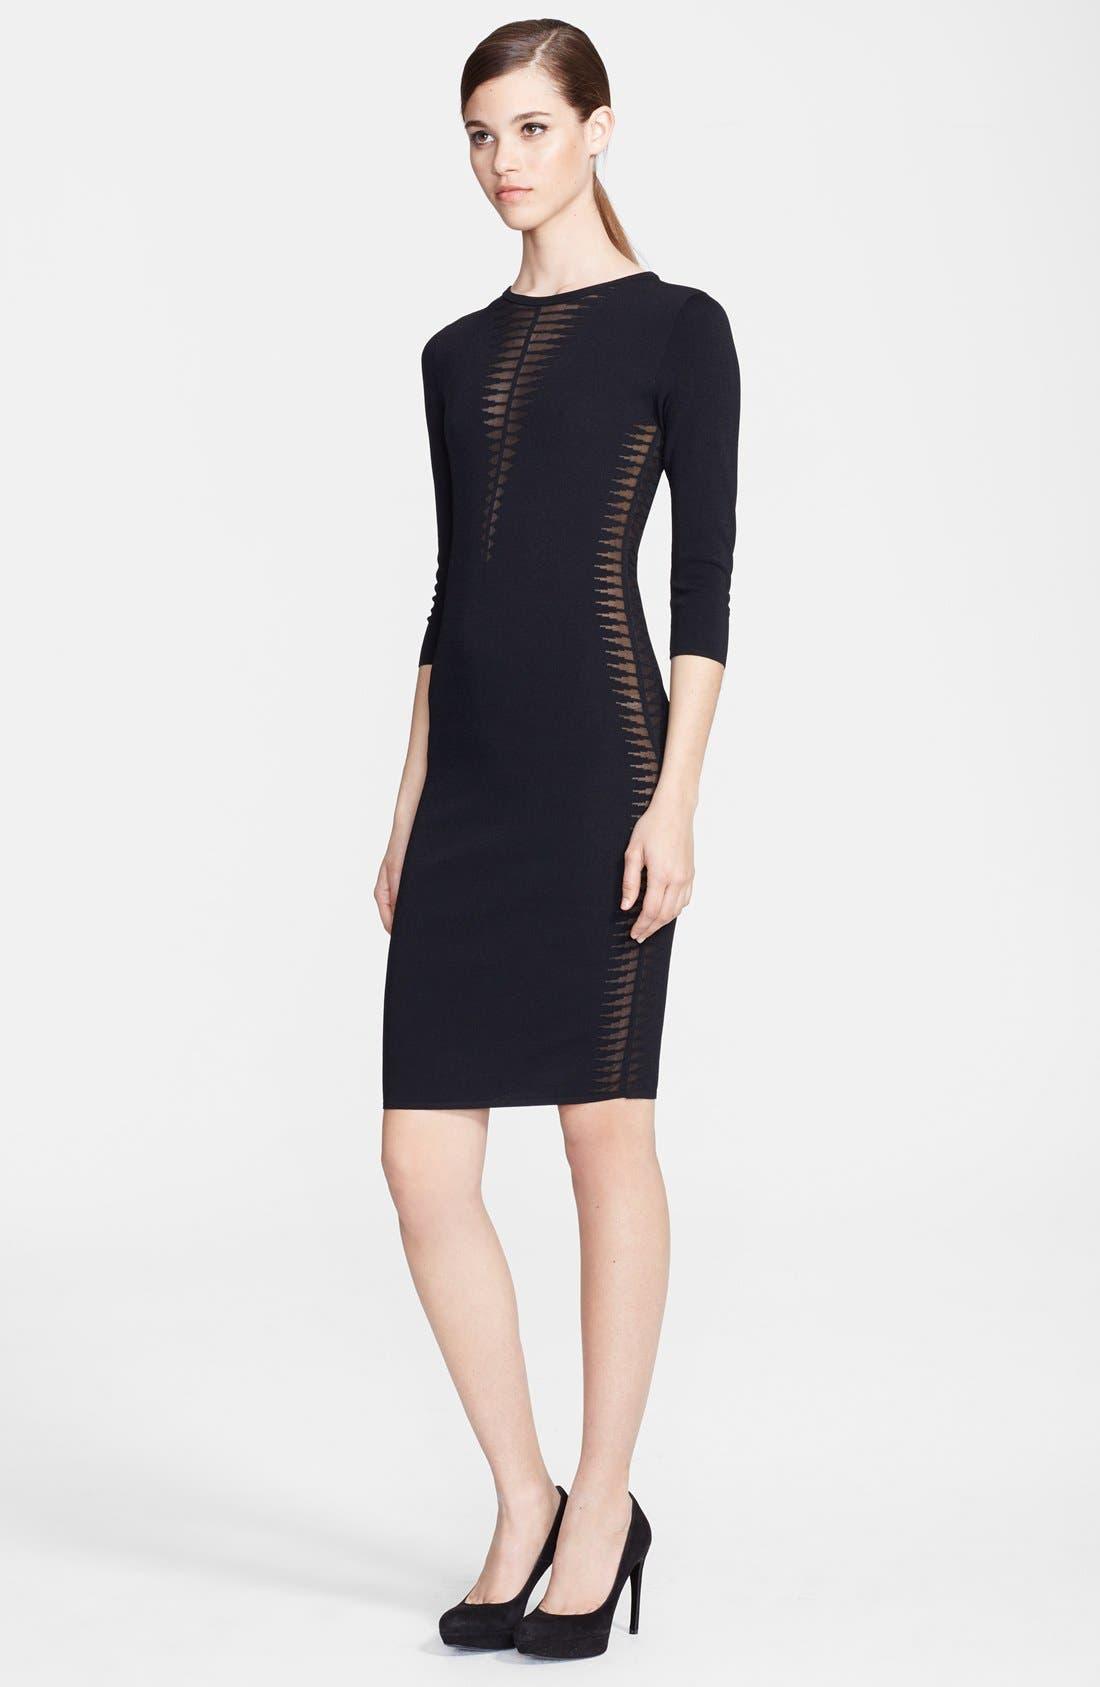 Main Image - Alexander McQueen Spine Knit Dress